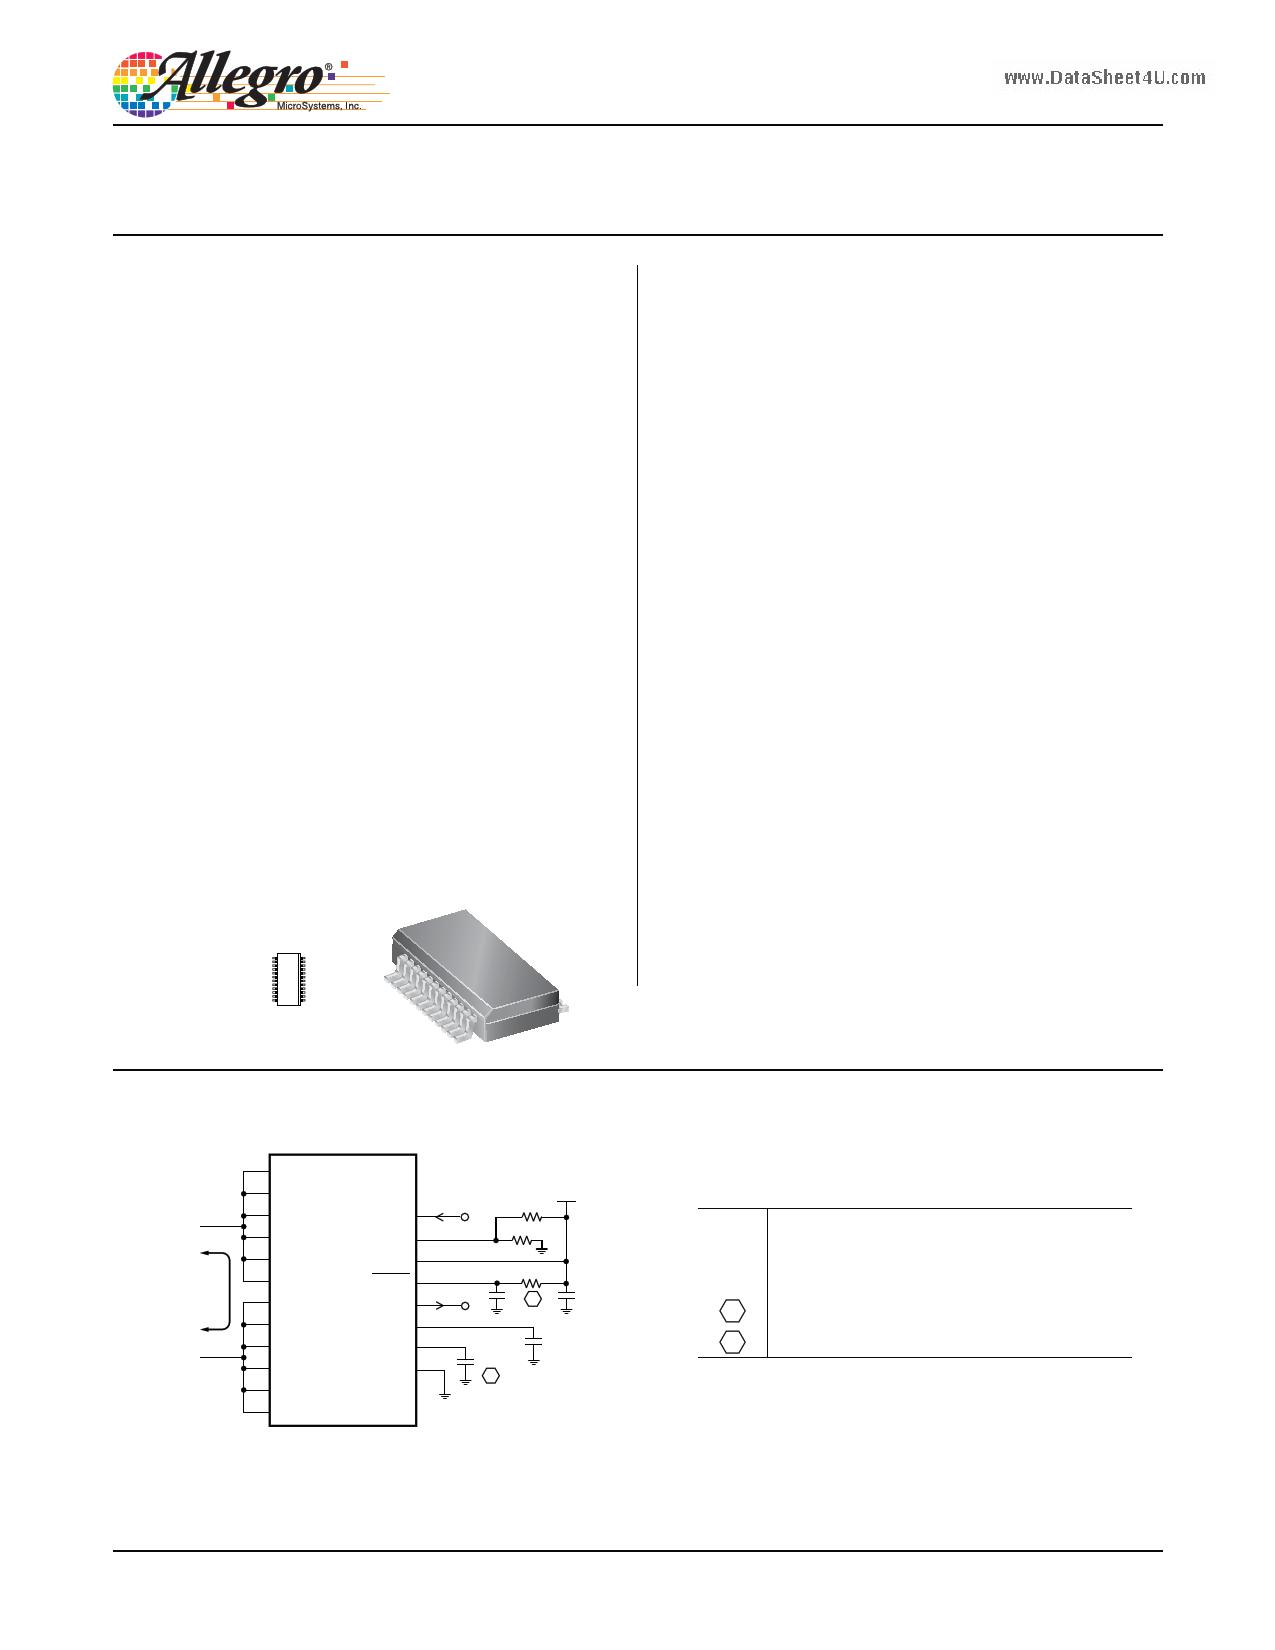 acs709 datasheet pdf pinout fast fault response. Black Bedroom Furniture Sets. Home Design Ideas